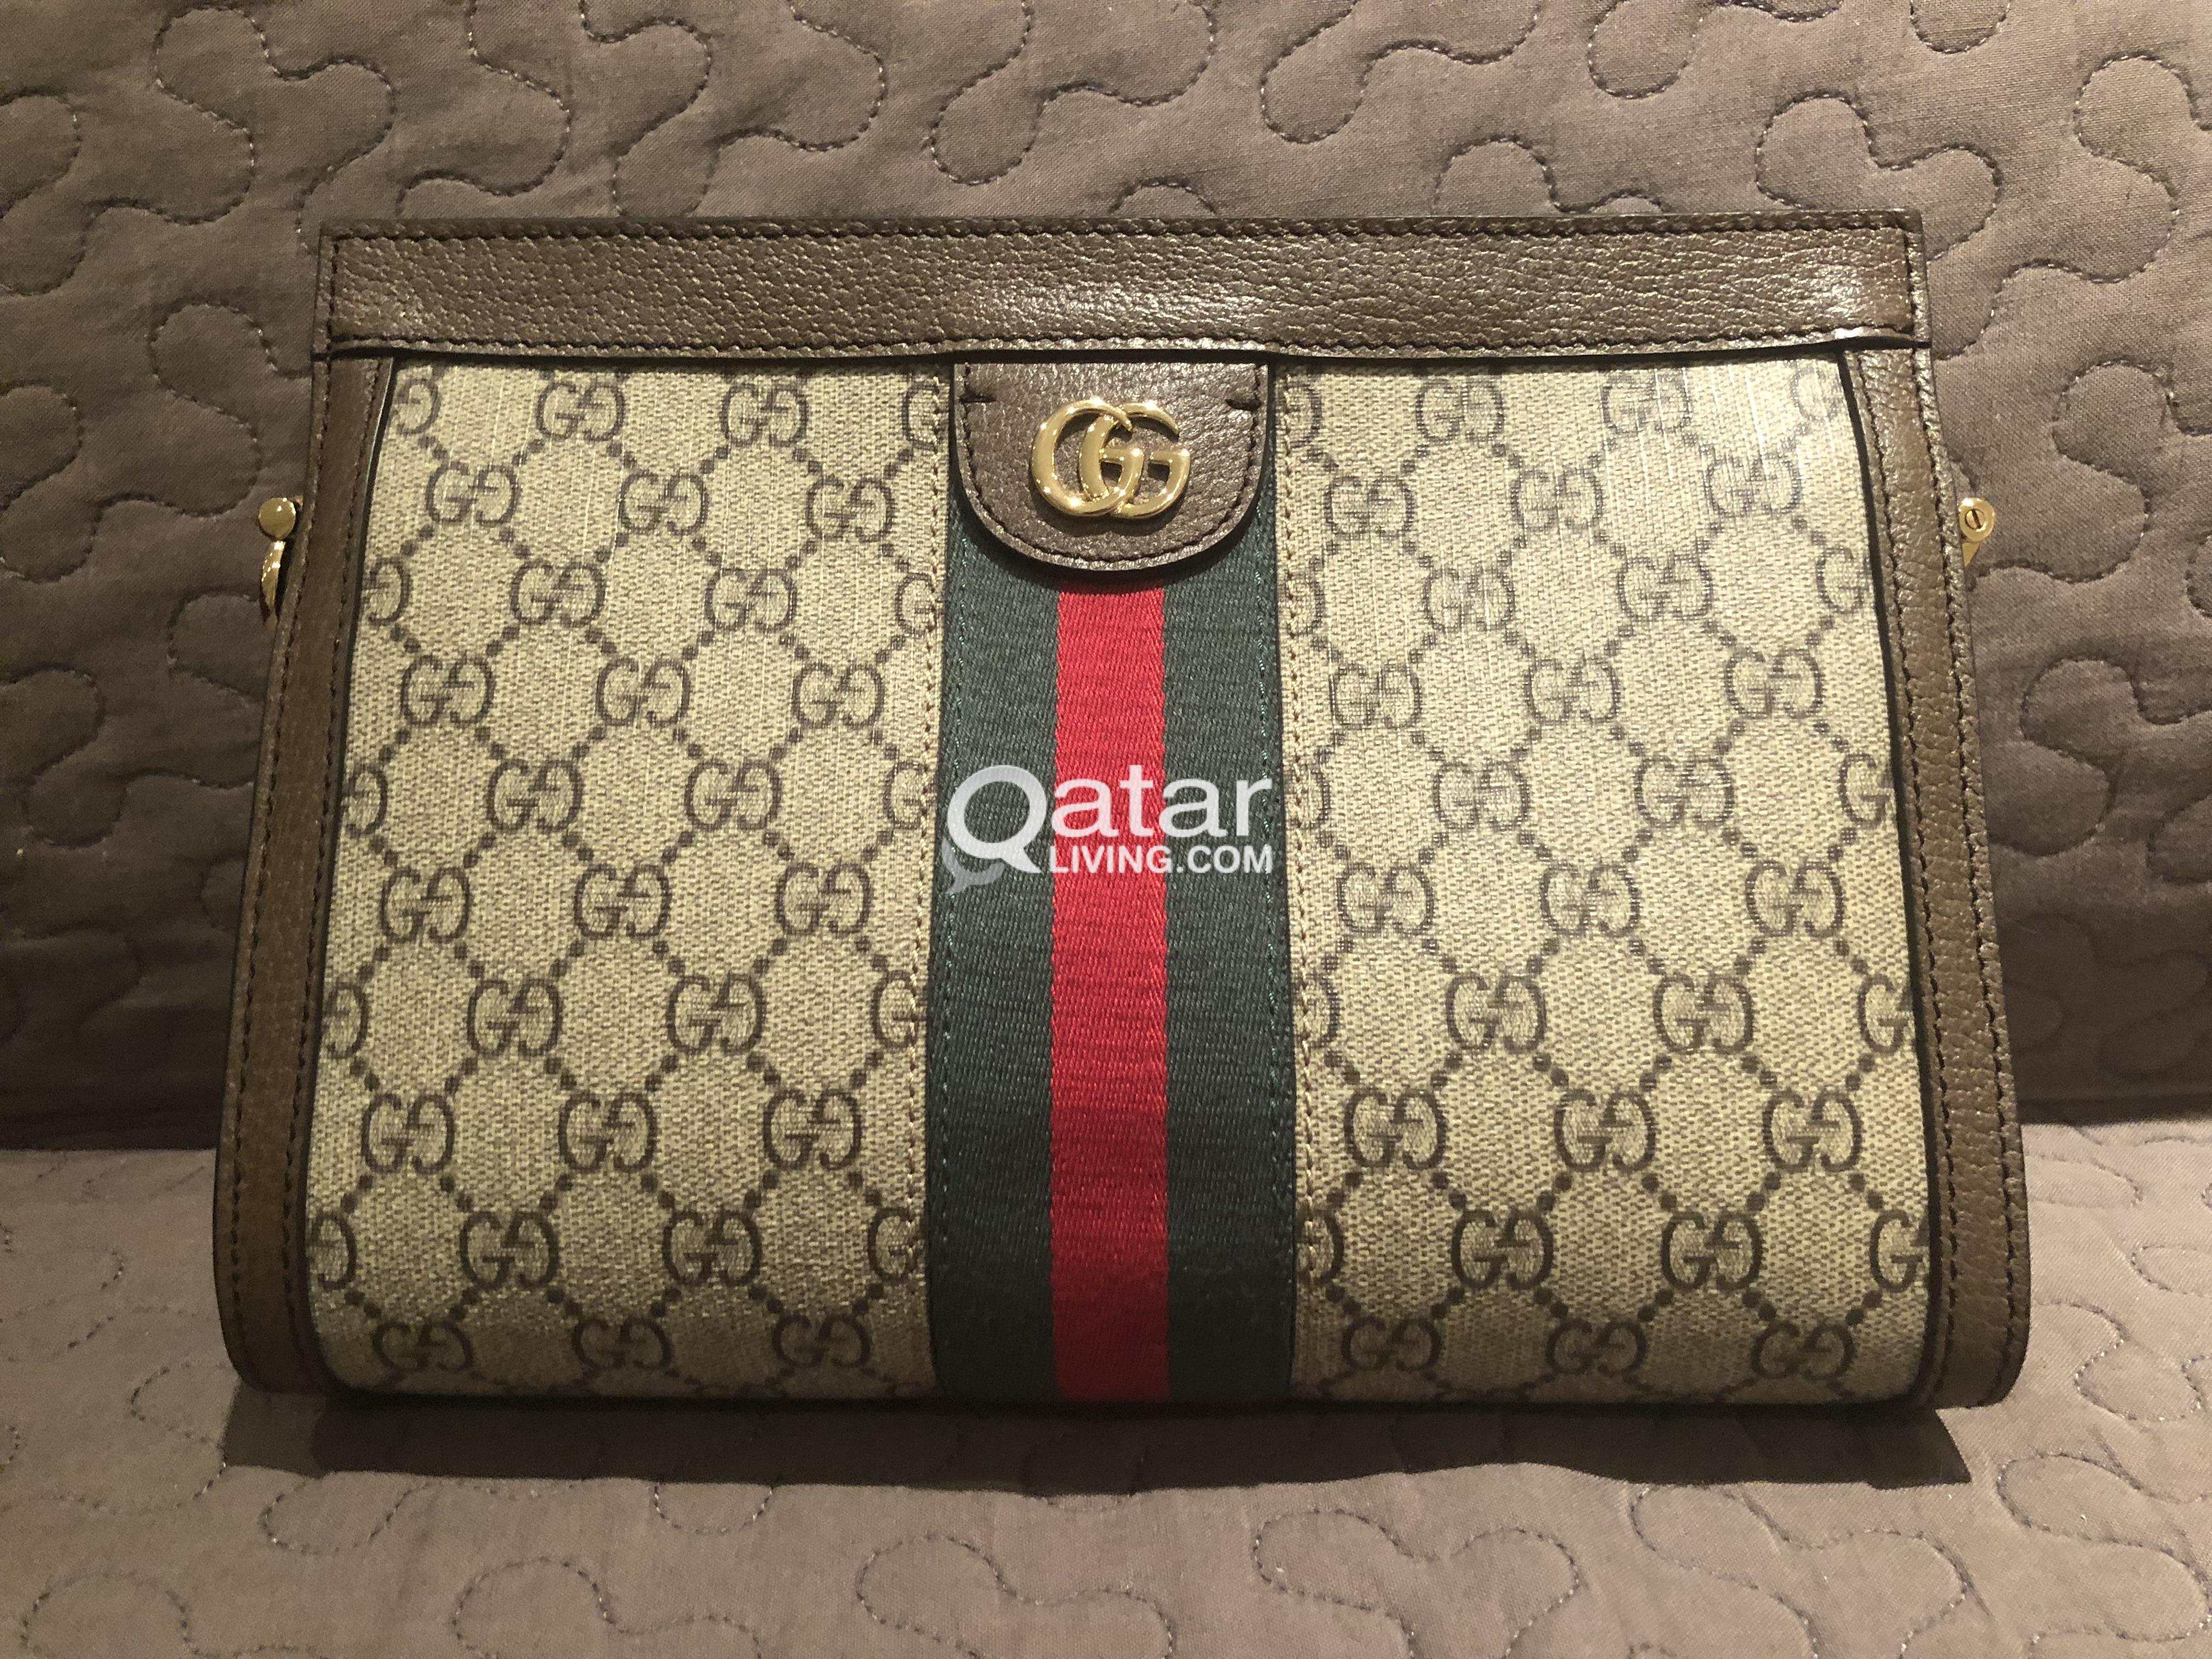 92fe47da1 Used Gucci - Ophidia GG small shoulder bag | Qatar Living